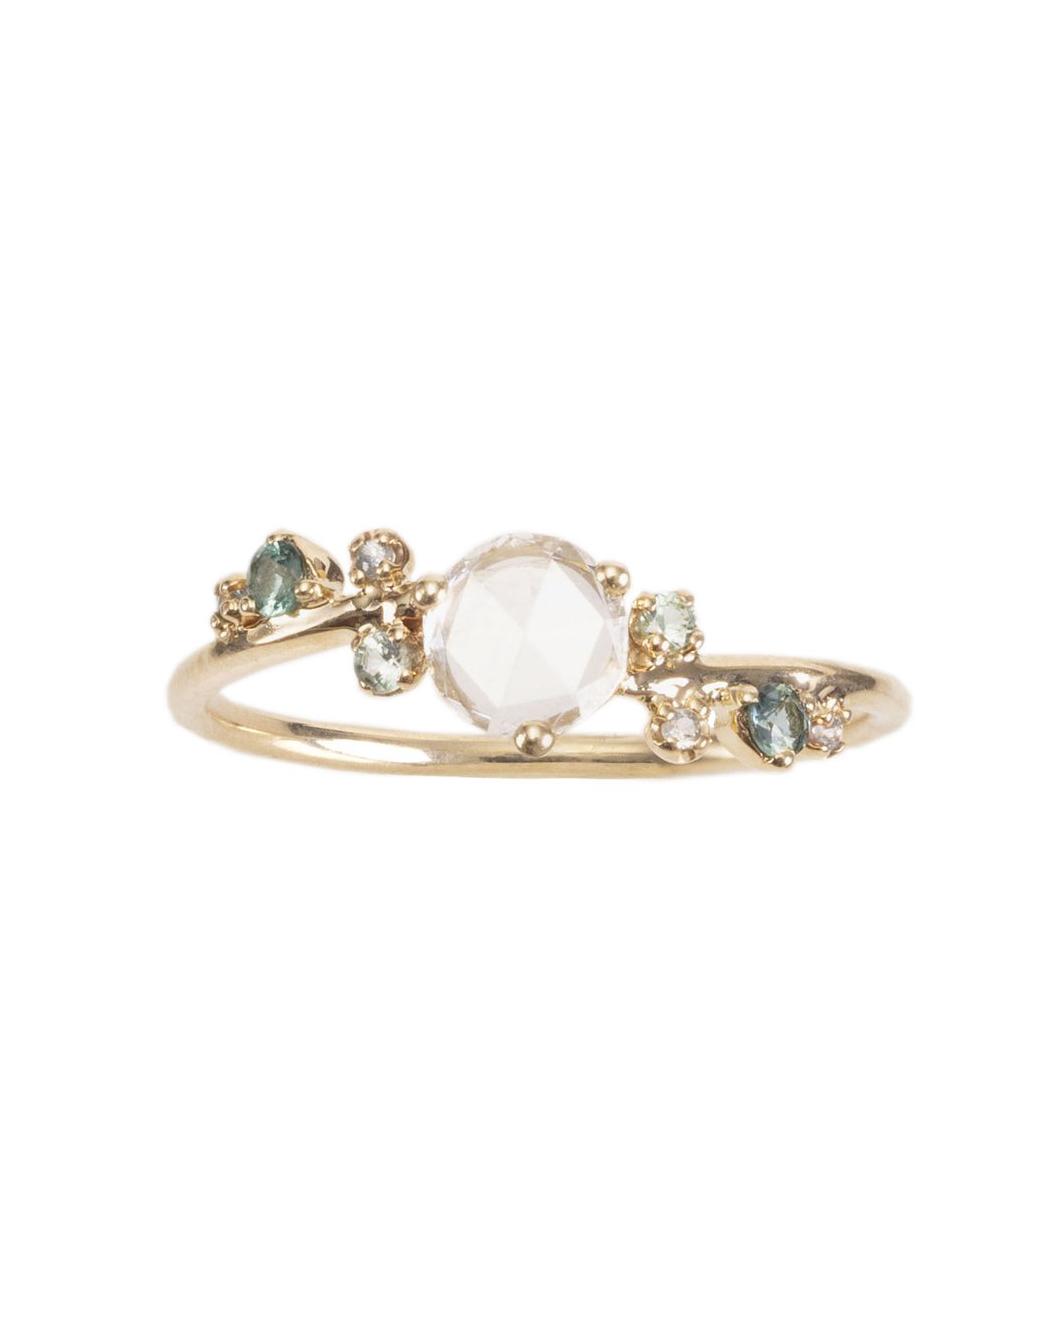 Limited Edition Medium Rose-Cut Diamond Tourmaline Organic Crossover Ring